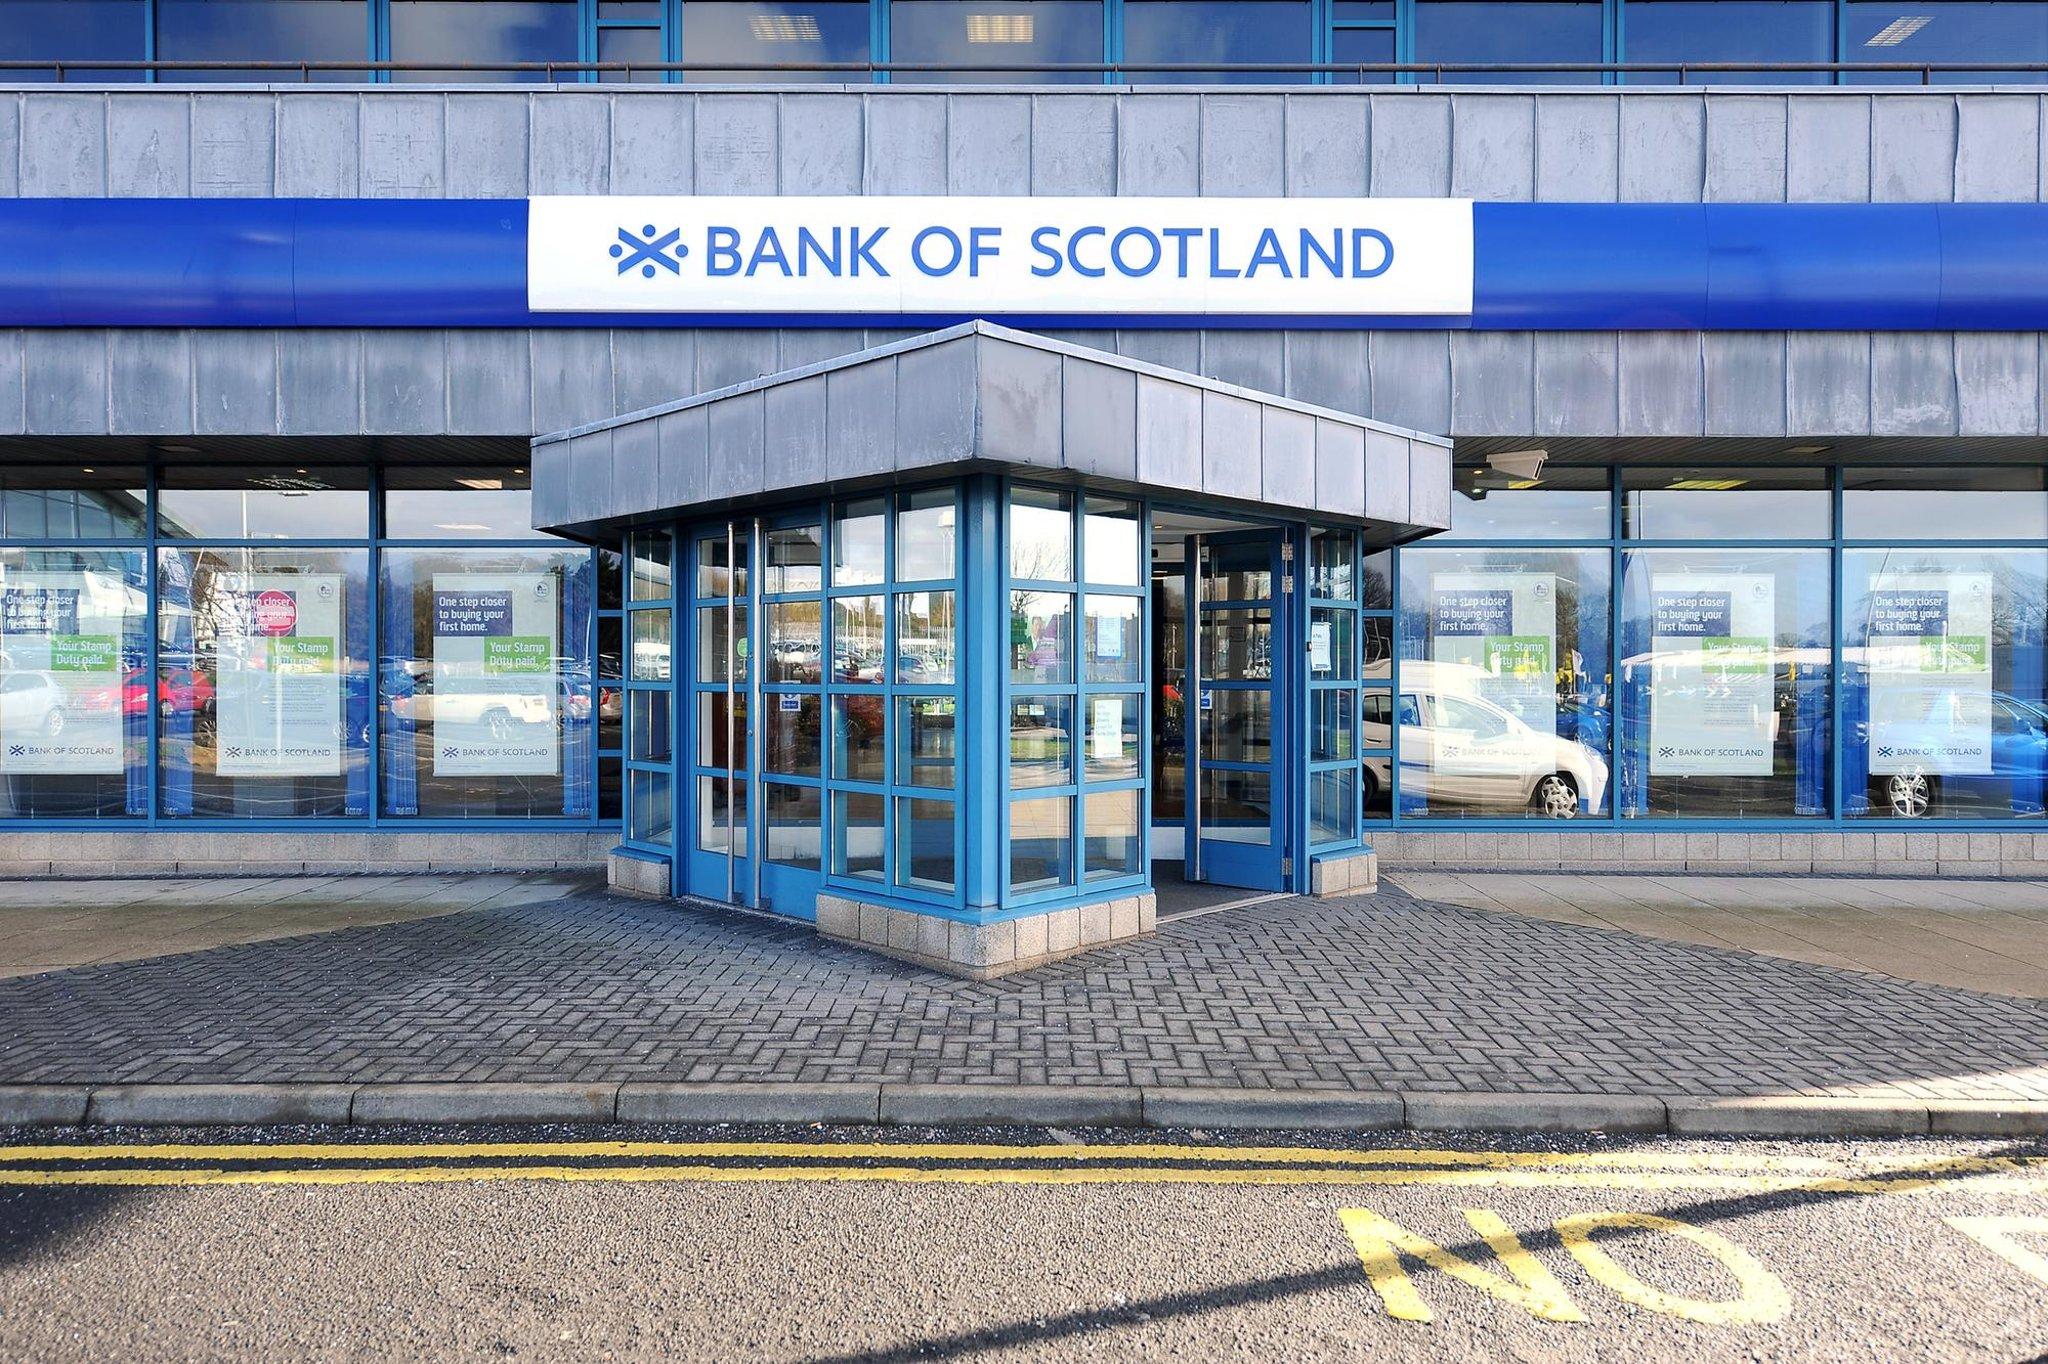 Kirkcaldy man 'threatened to kill' Bank of Scotland staff member